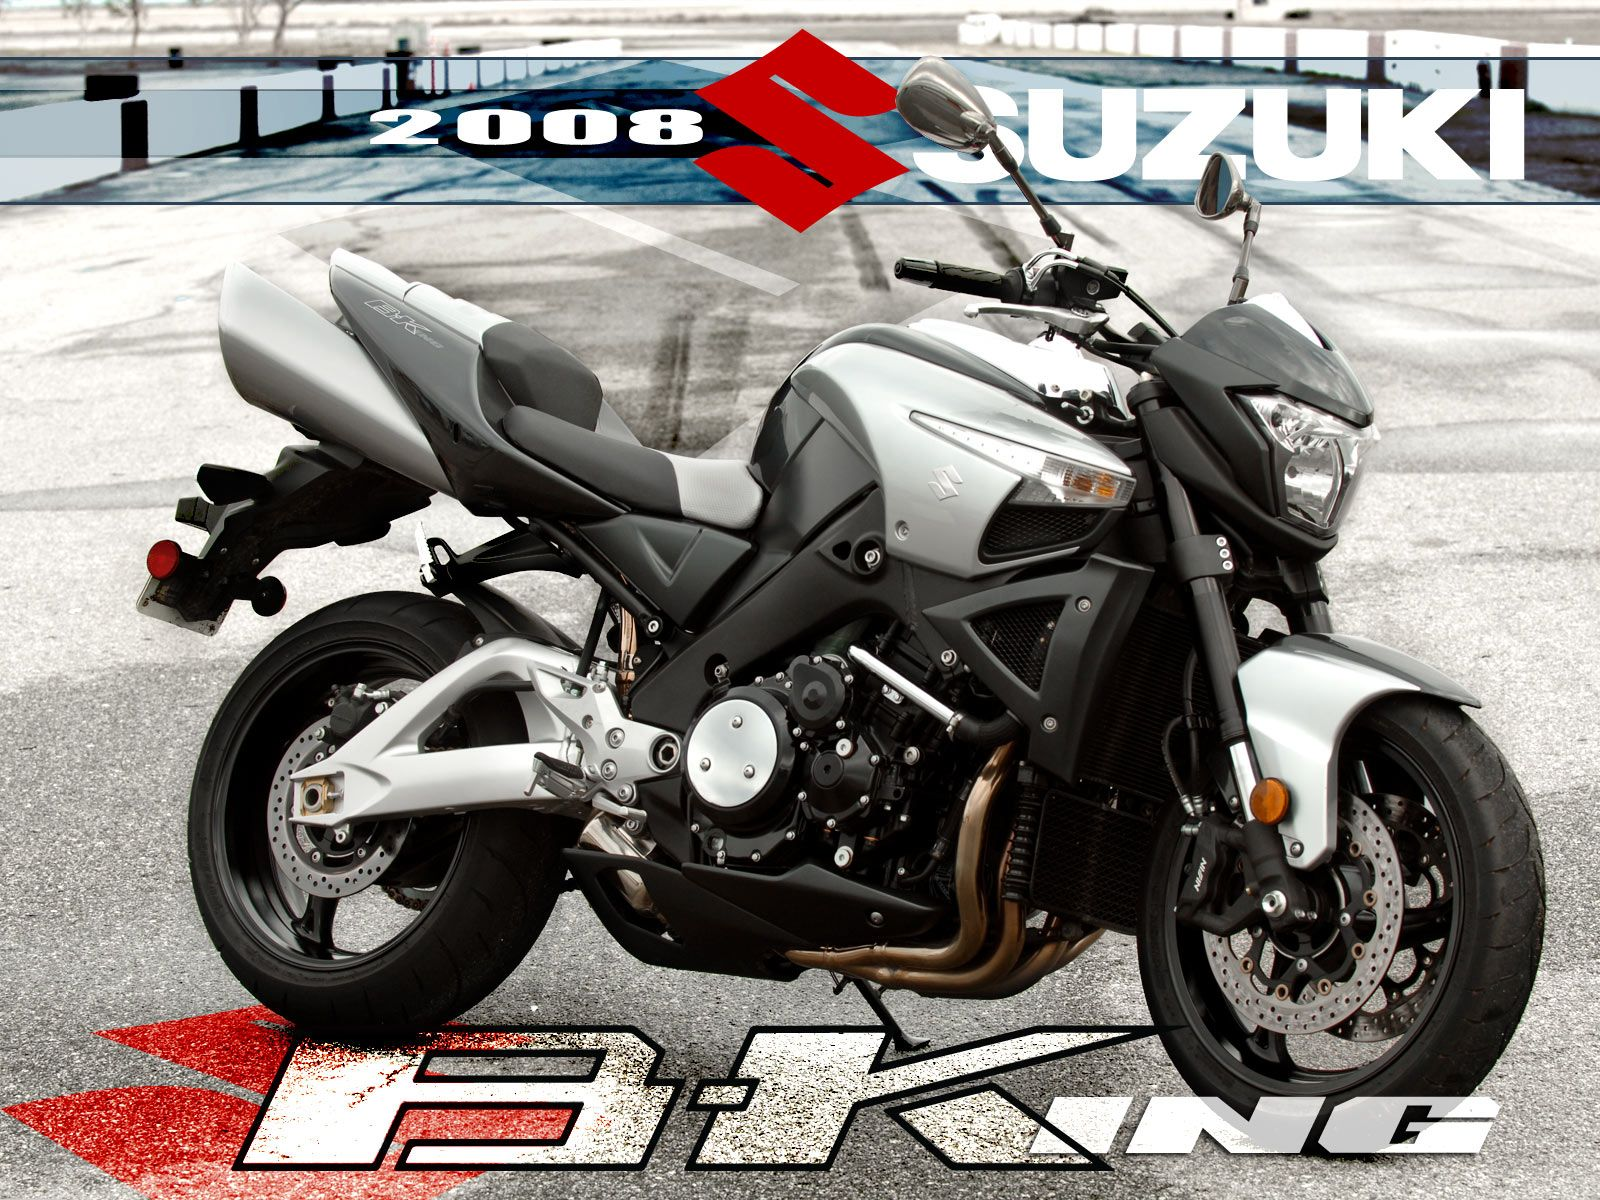 Suzuki 2008 b king google search